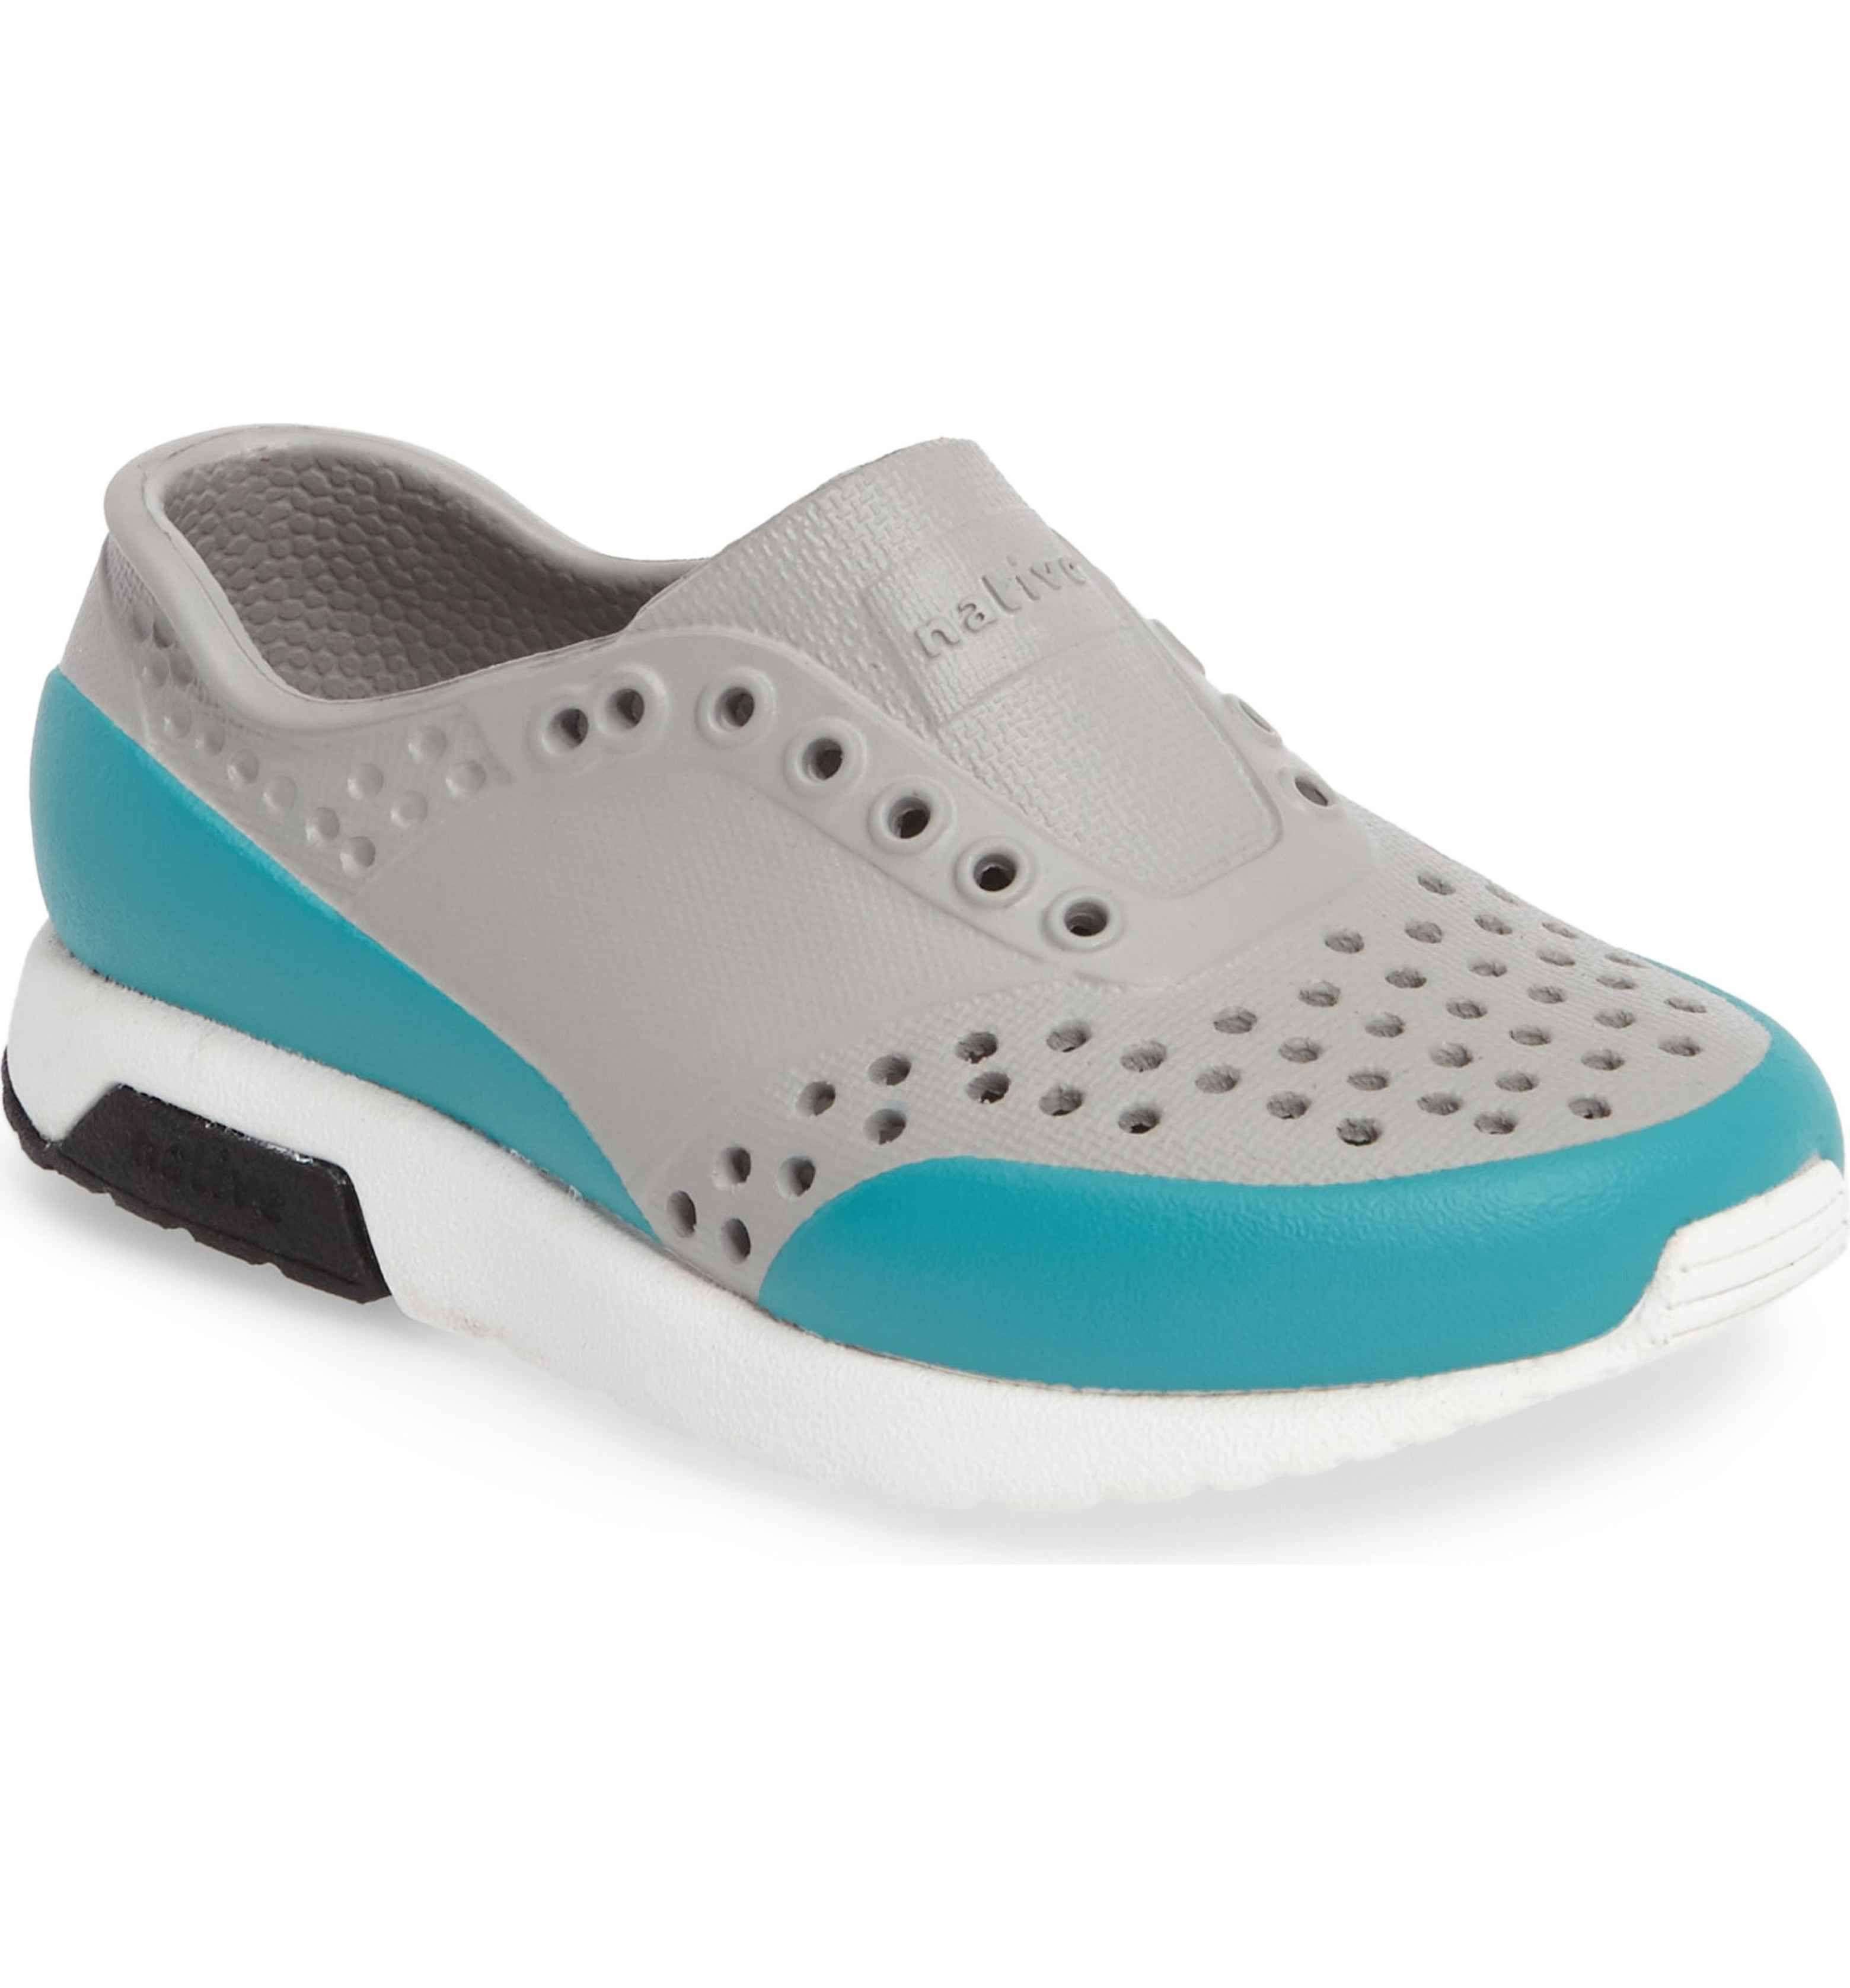 Main Image Native Shoes Lennox Block Slip Sneaker Baby Walker